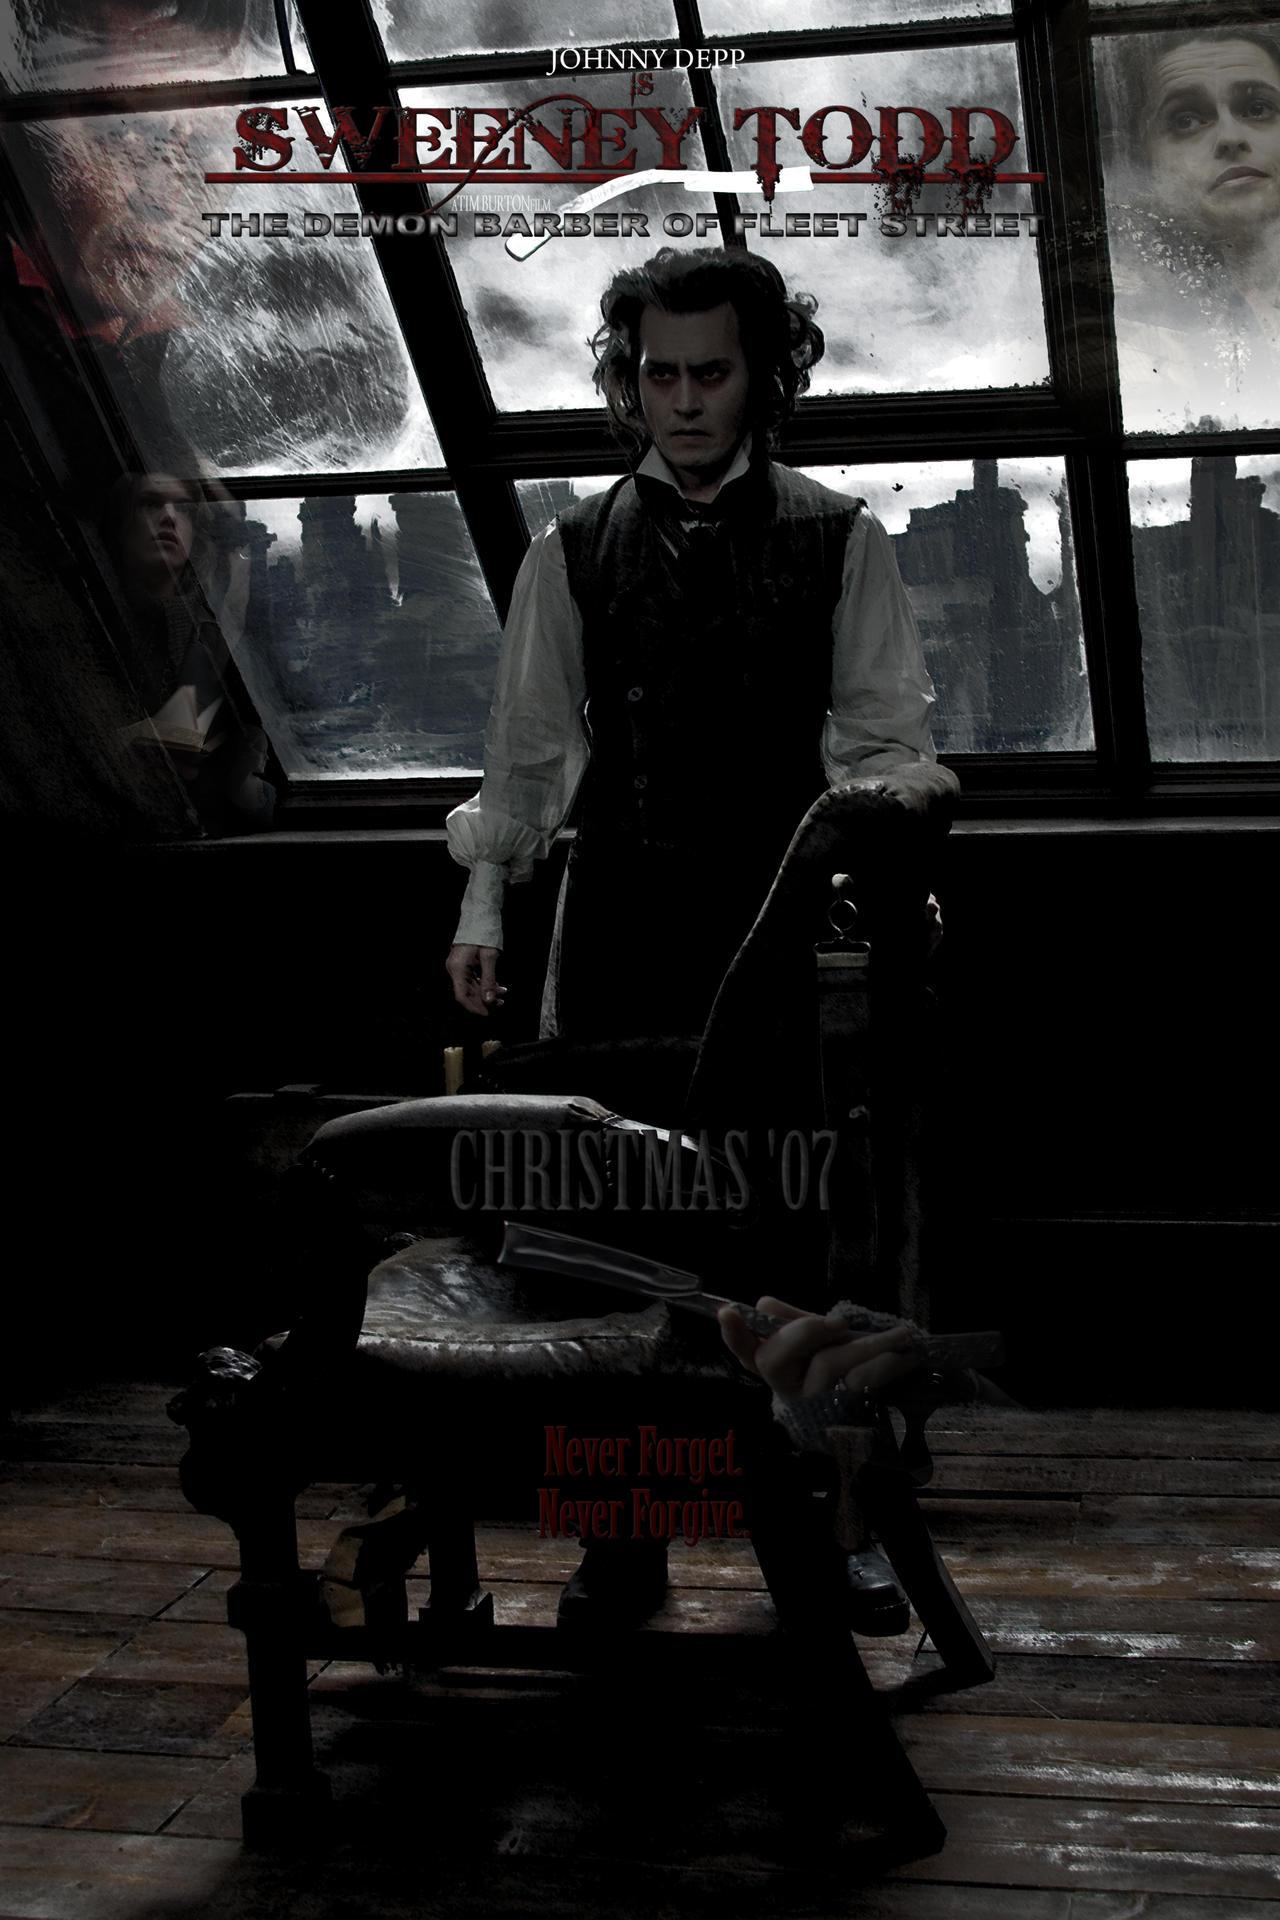 sweeney todd movie poster by skrobo on deviantart